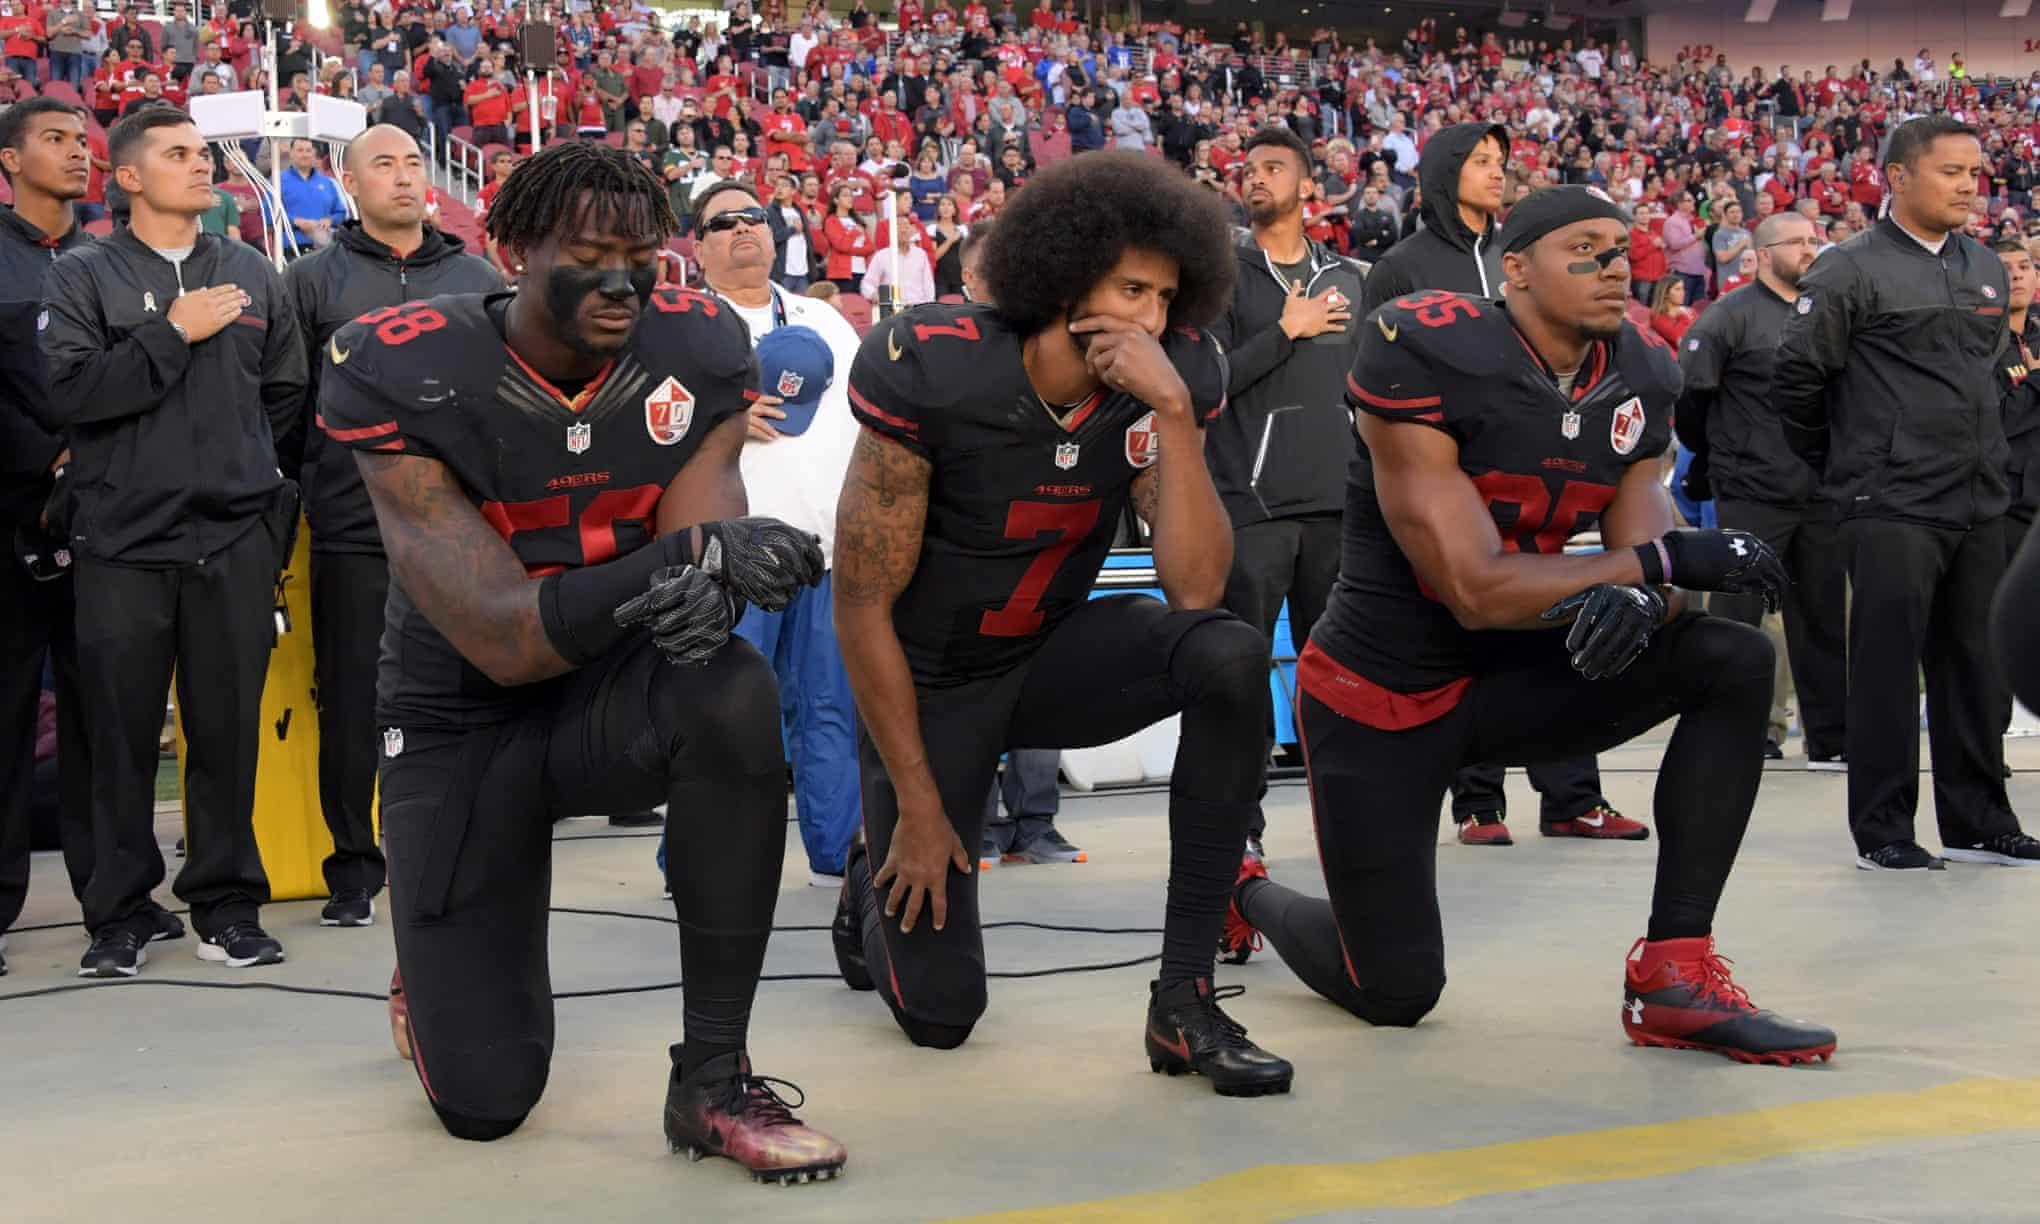 Colin Kaepernick protest